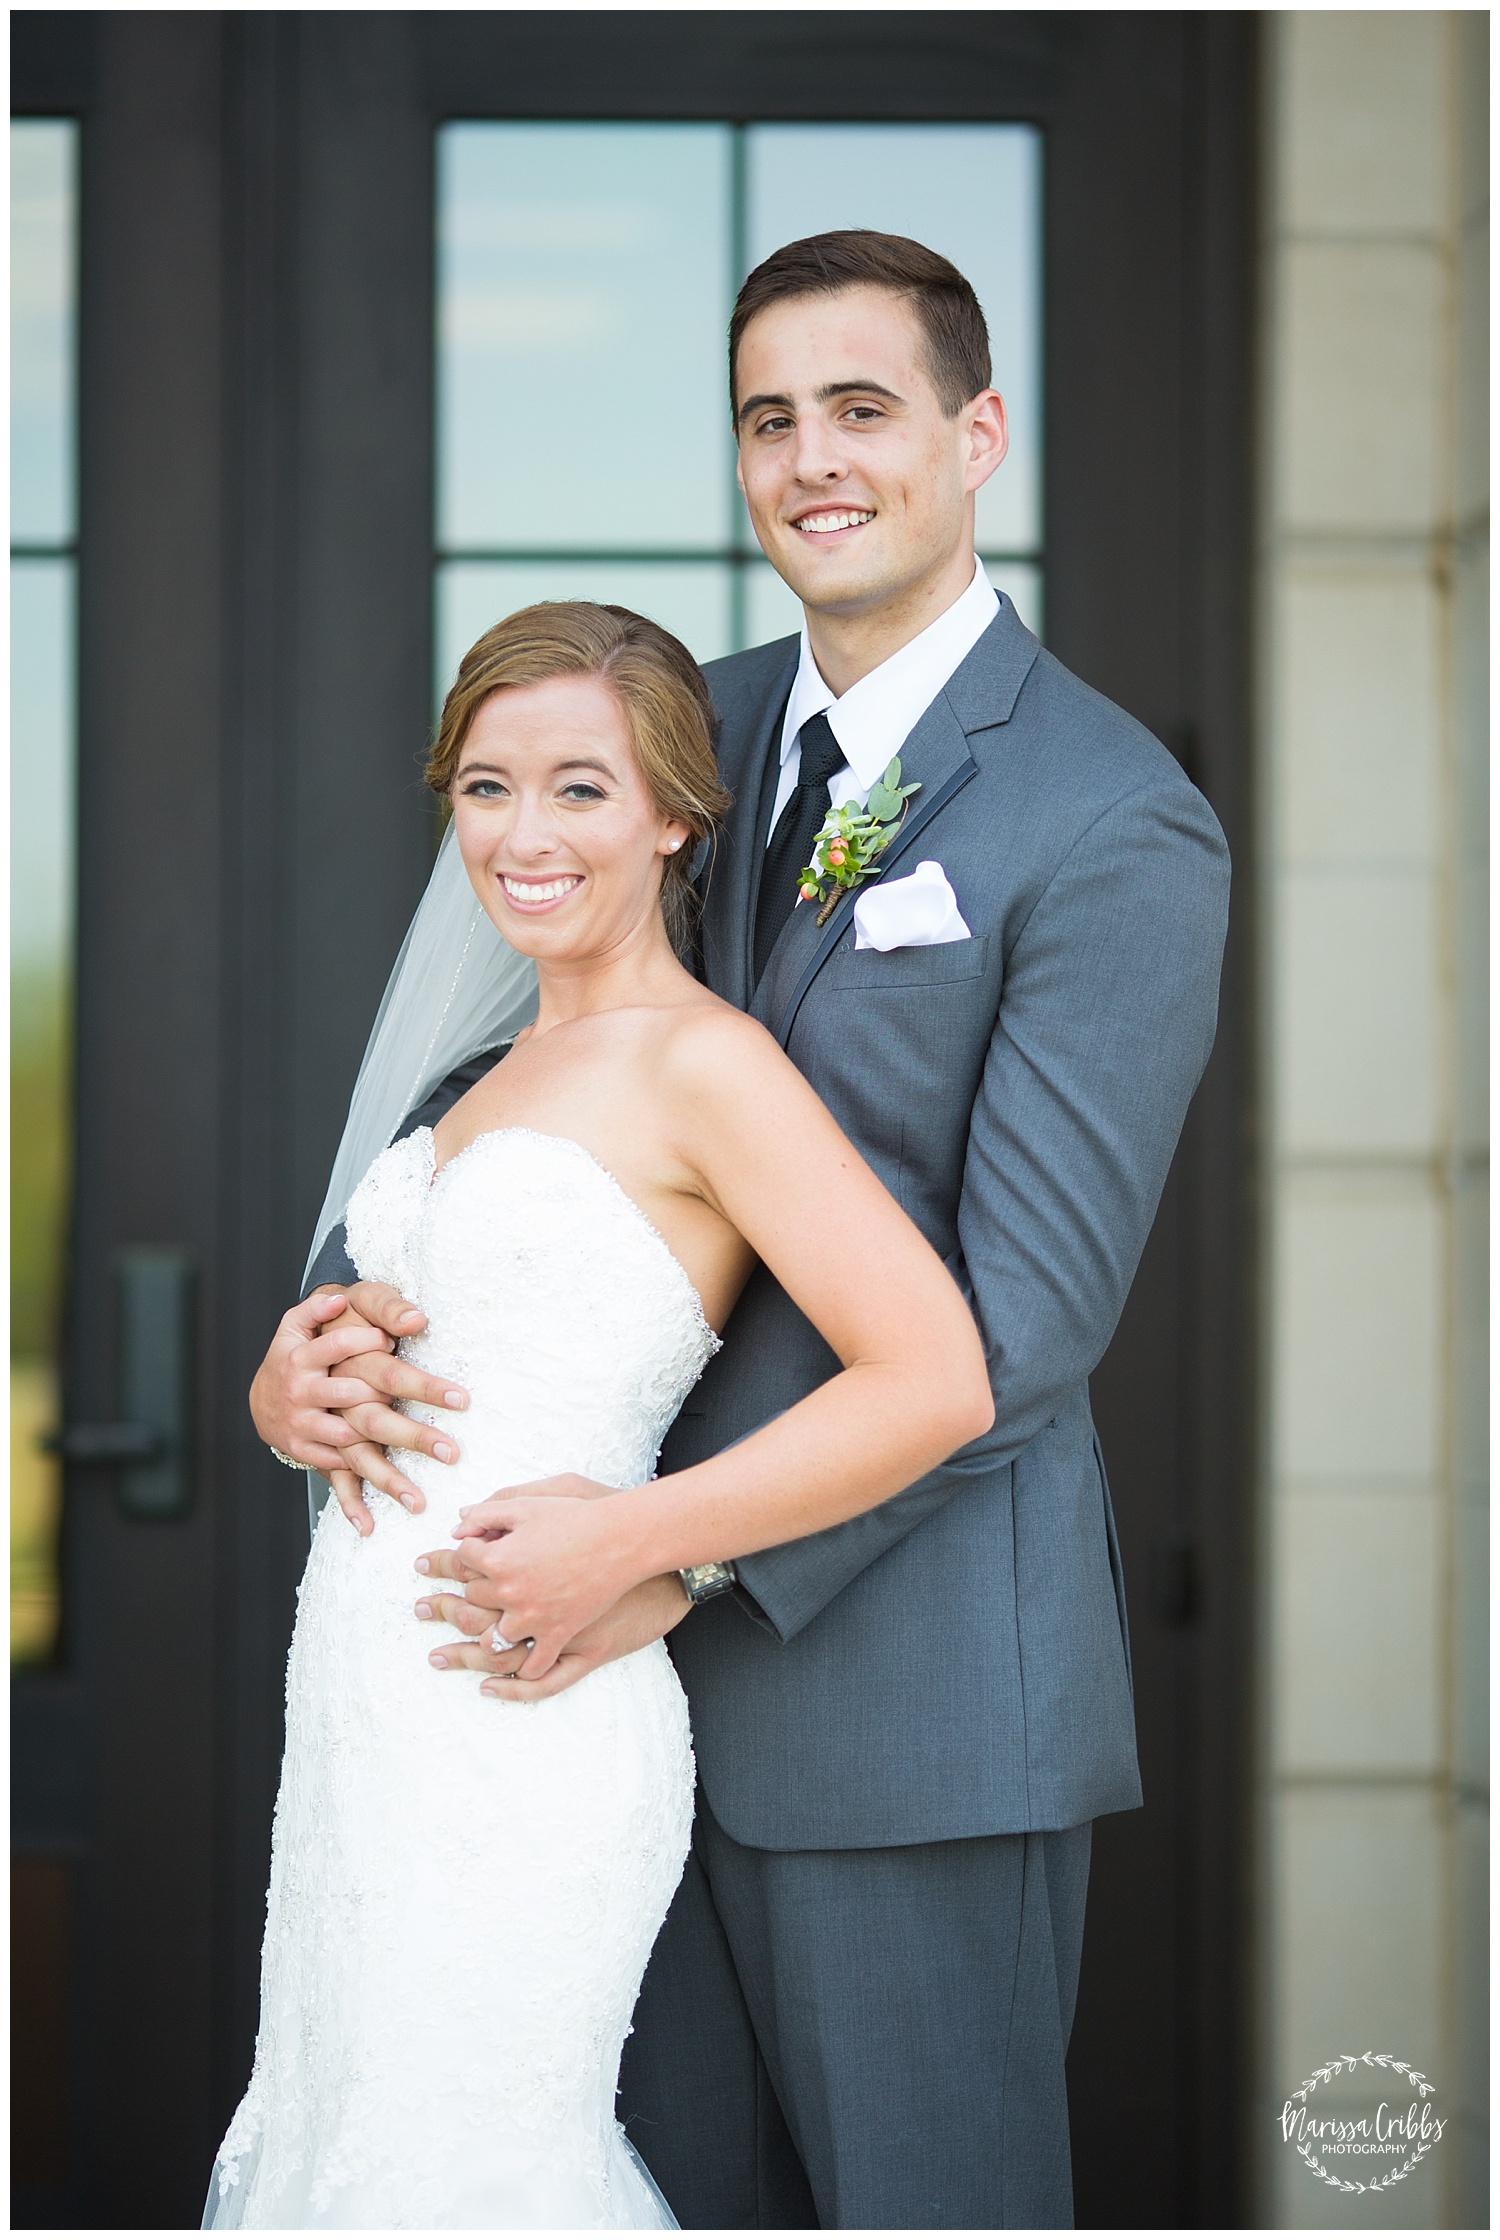 Twin Double Wedding | Union Horse Distilling Co. | Marissa Cribbs Photography | KC Weddings_0117.jpg